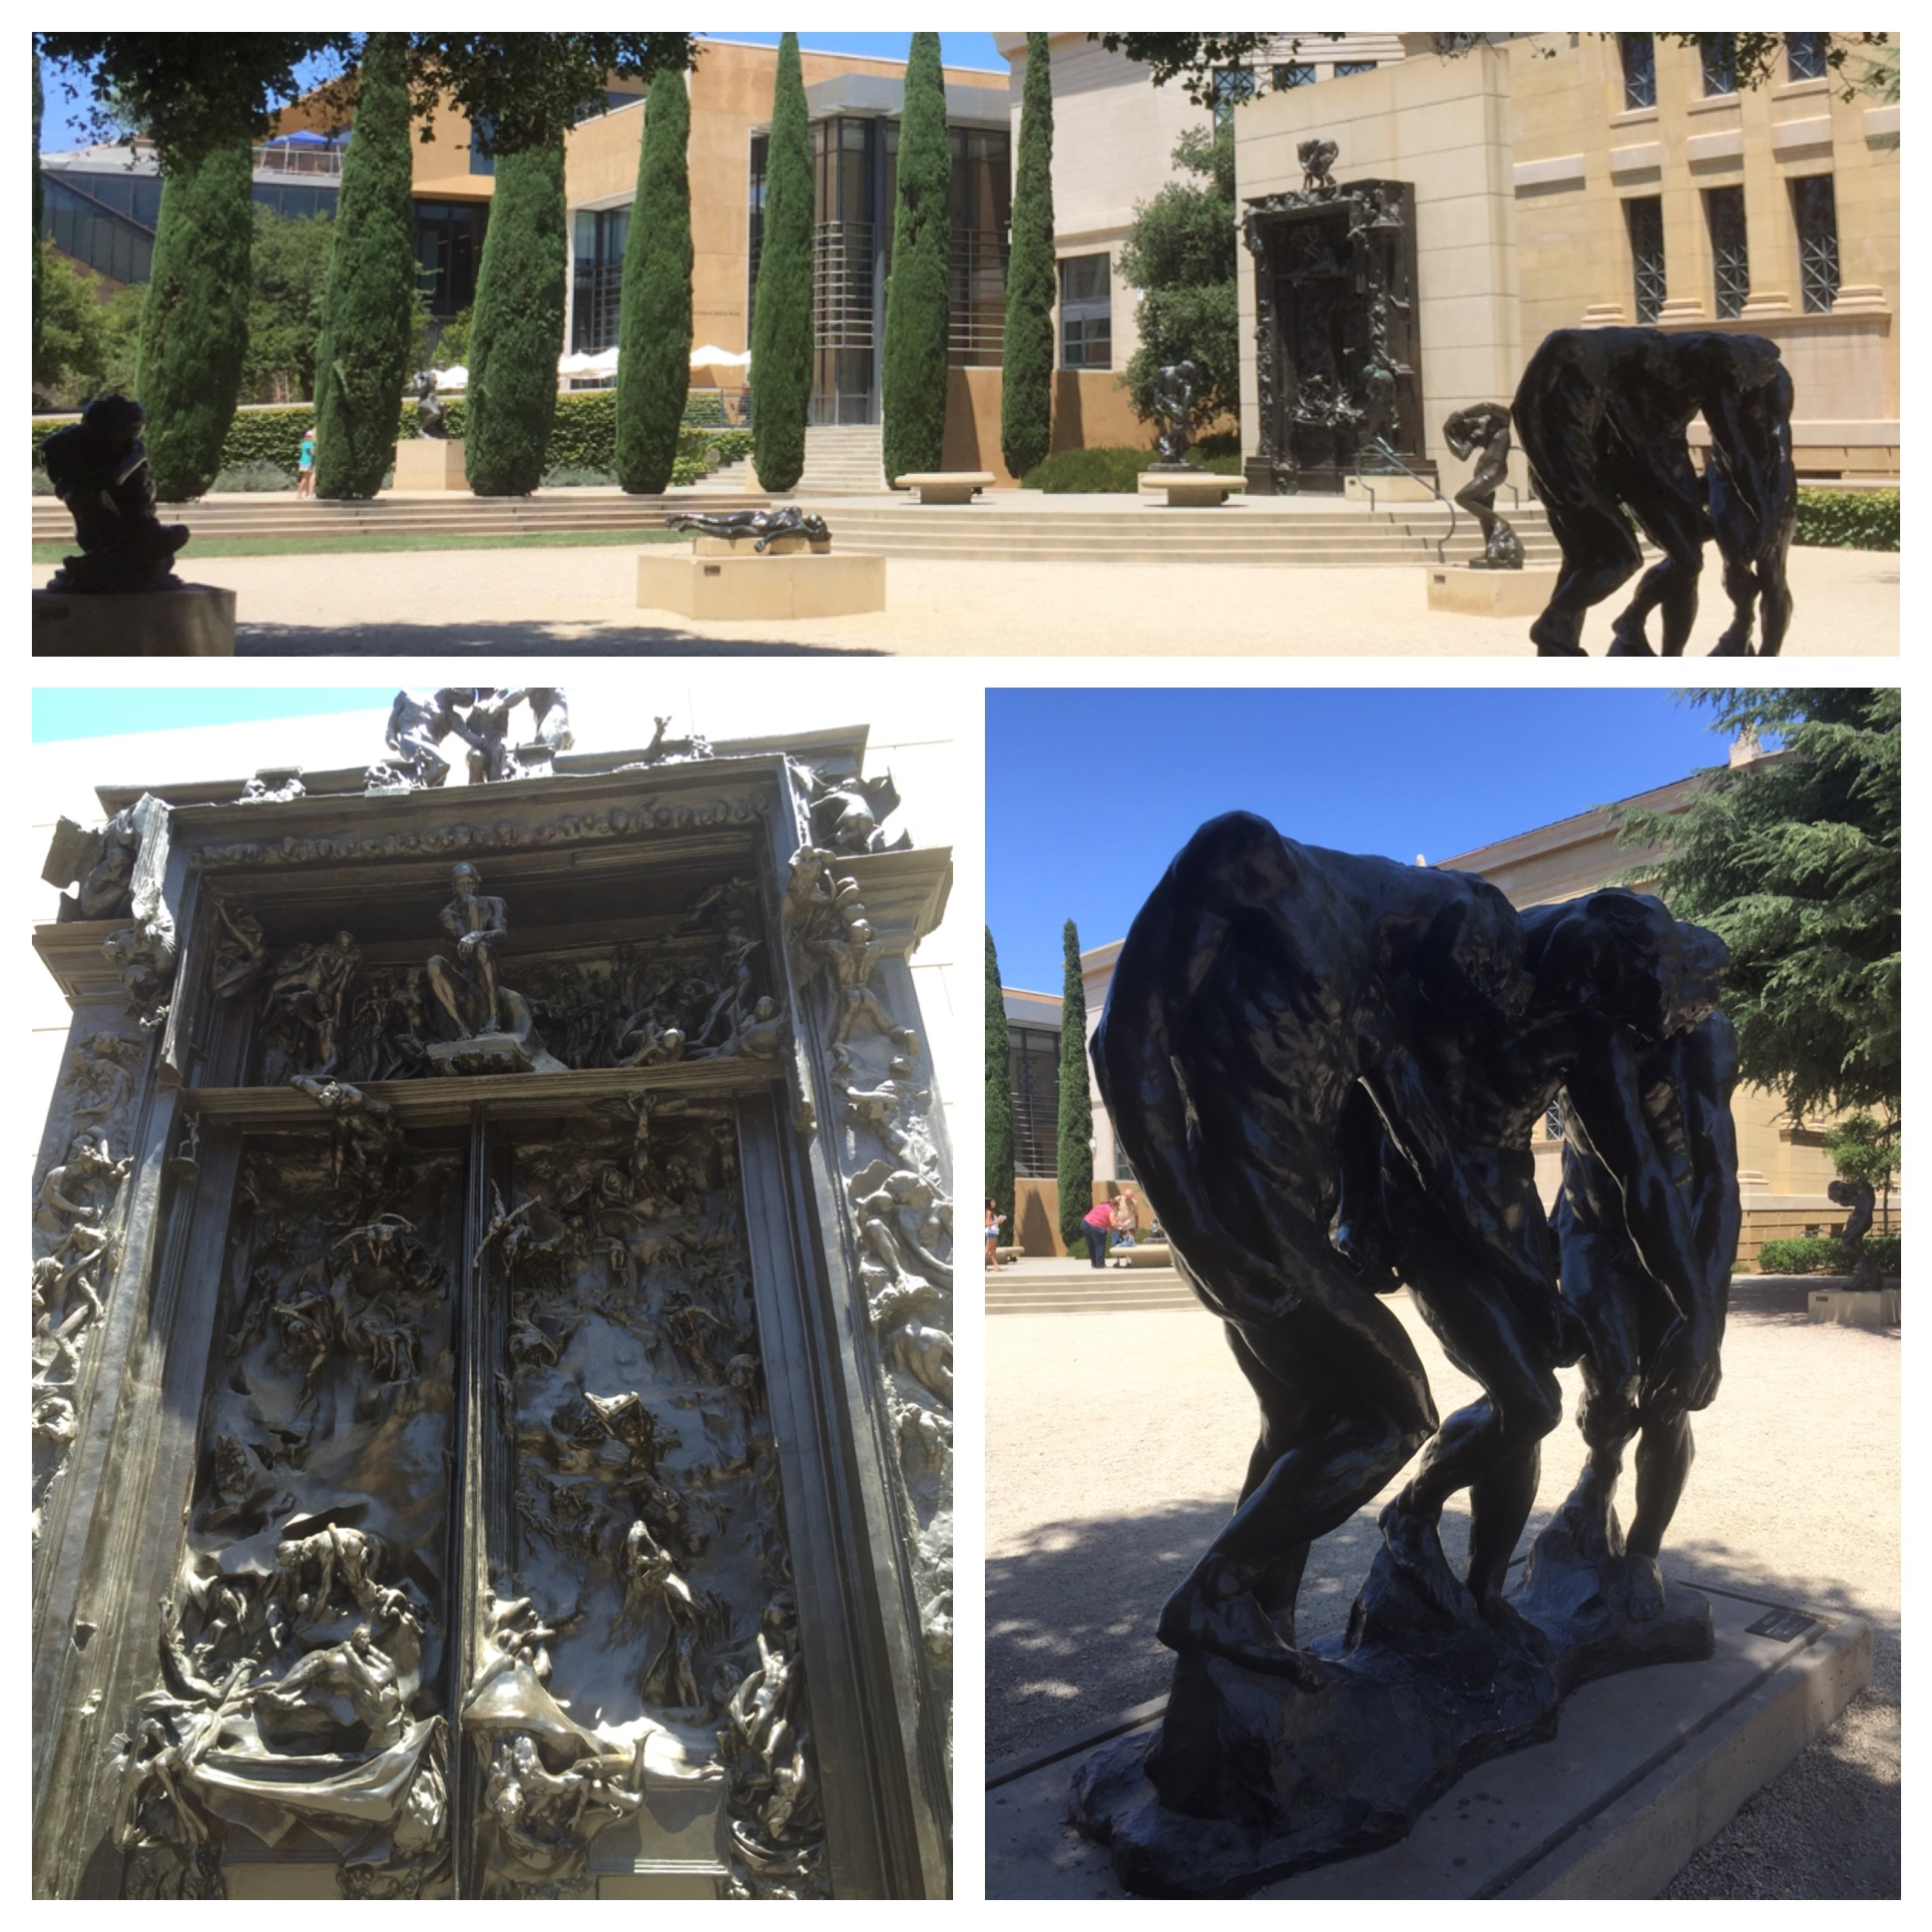 Jardim com as esculturas de Rodin